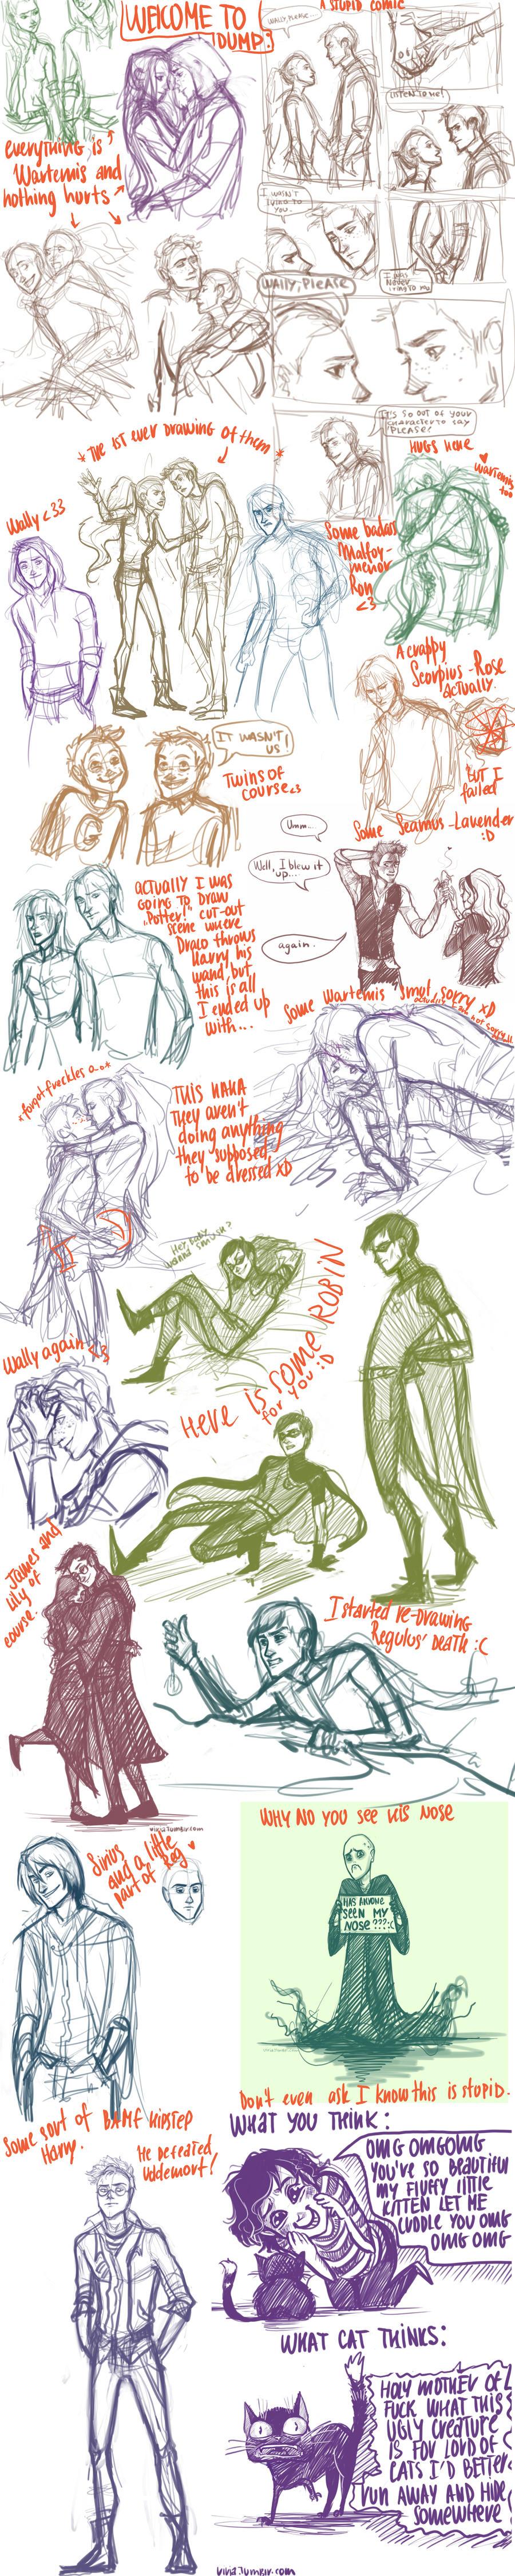 that's like I do really enjoy finishing my draws by viria13